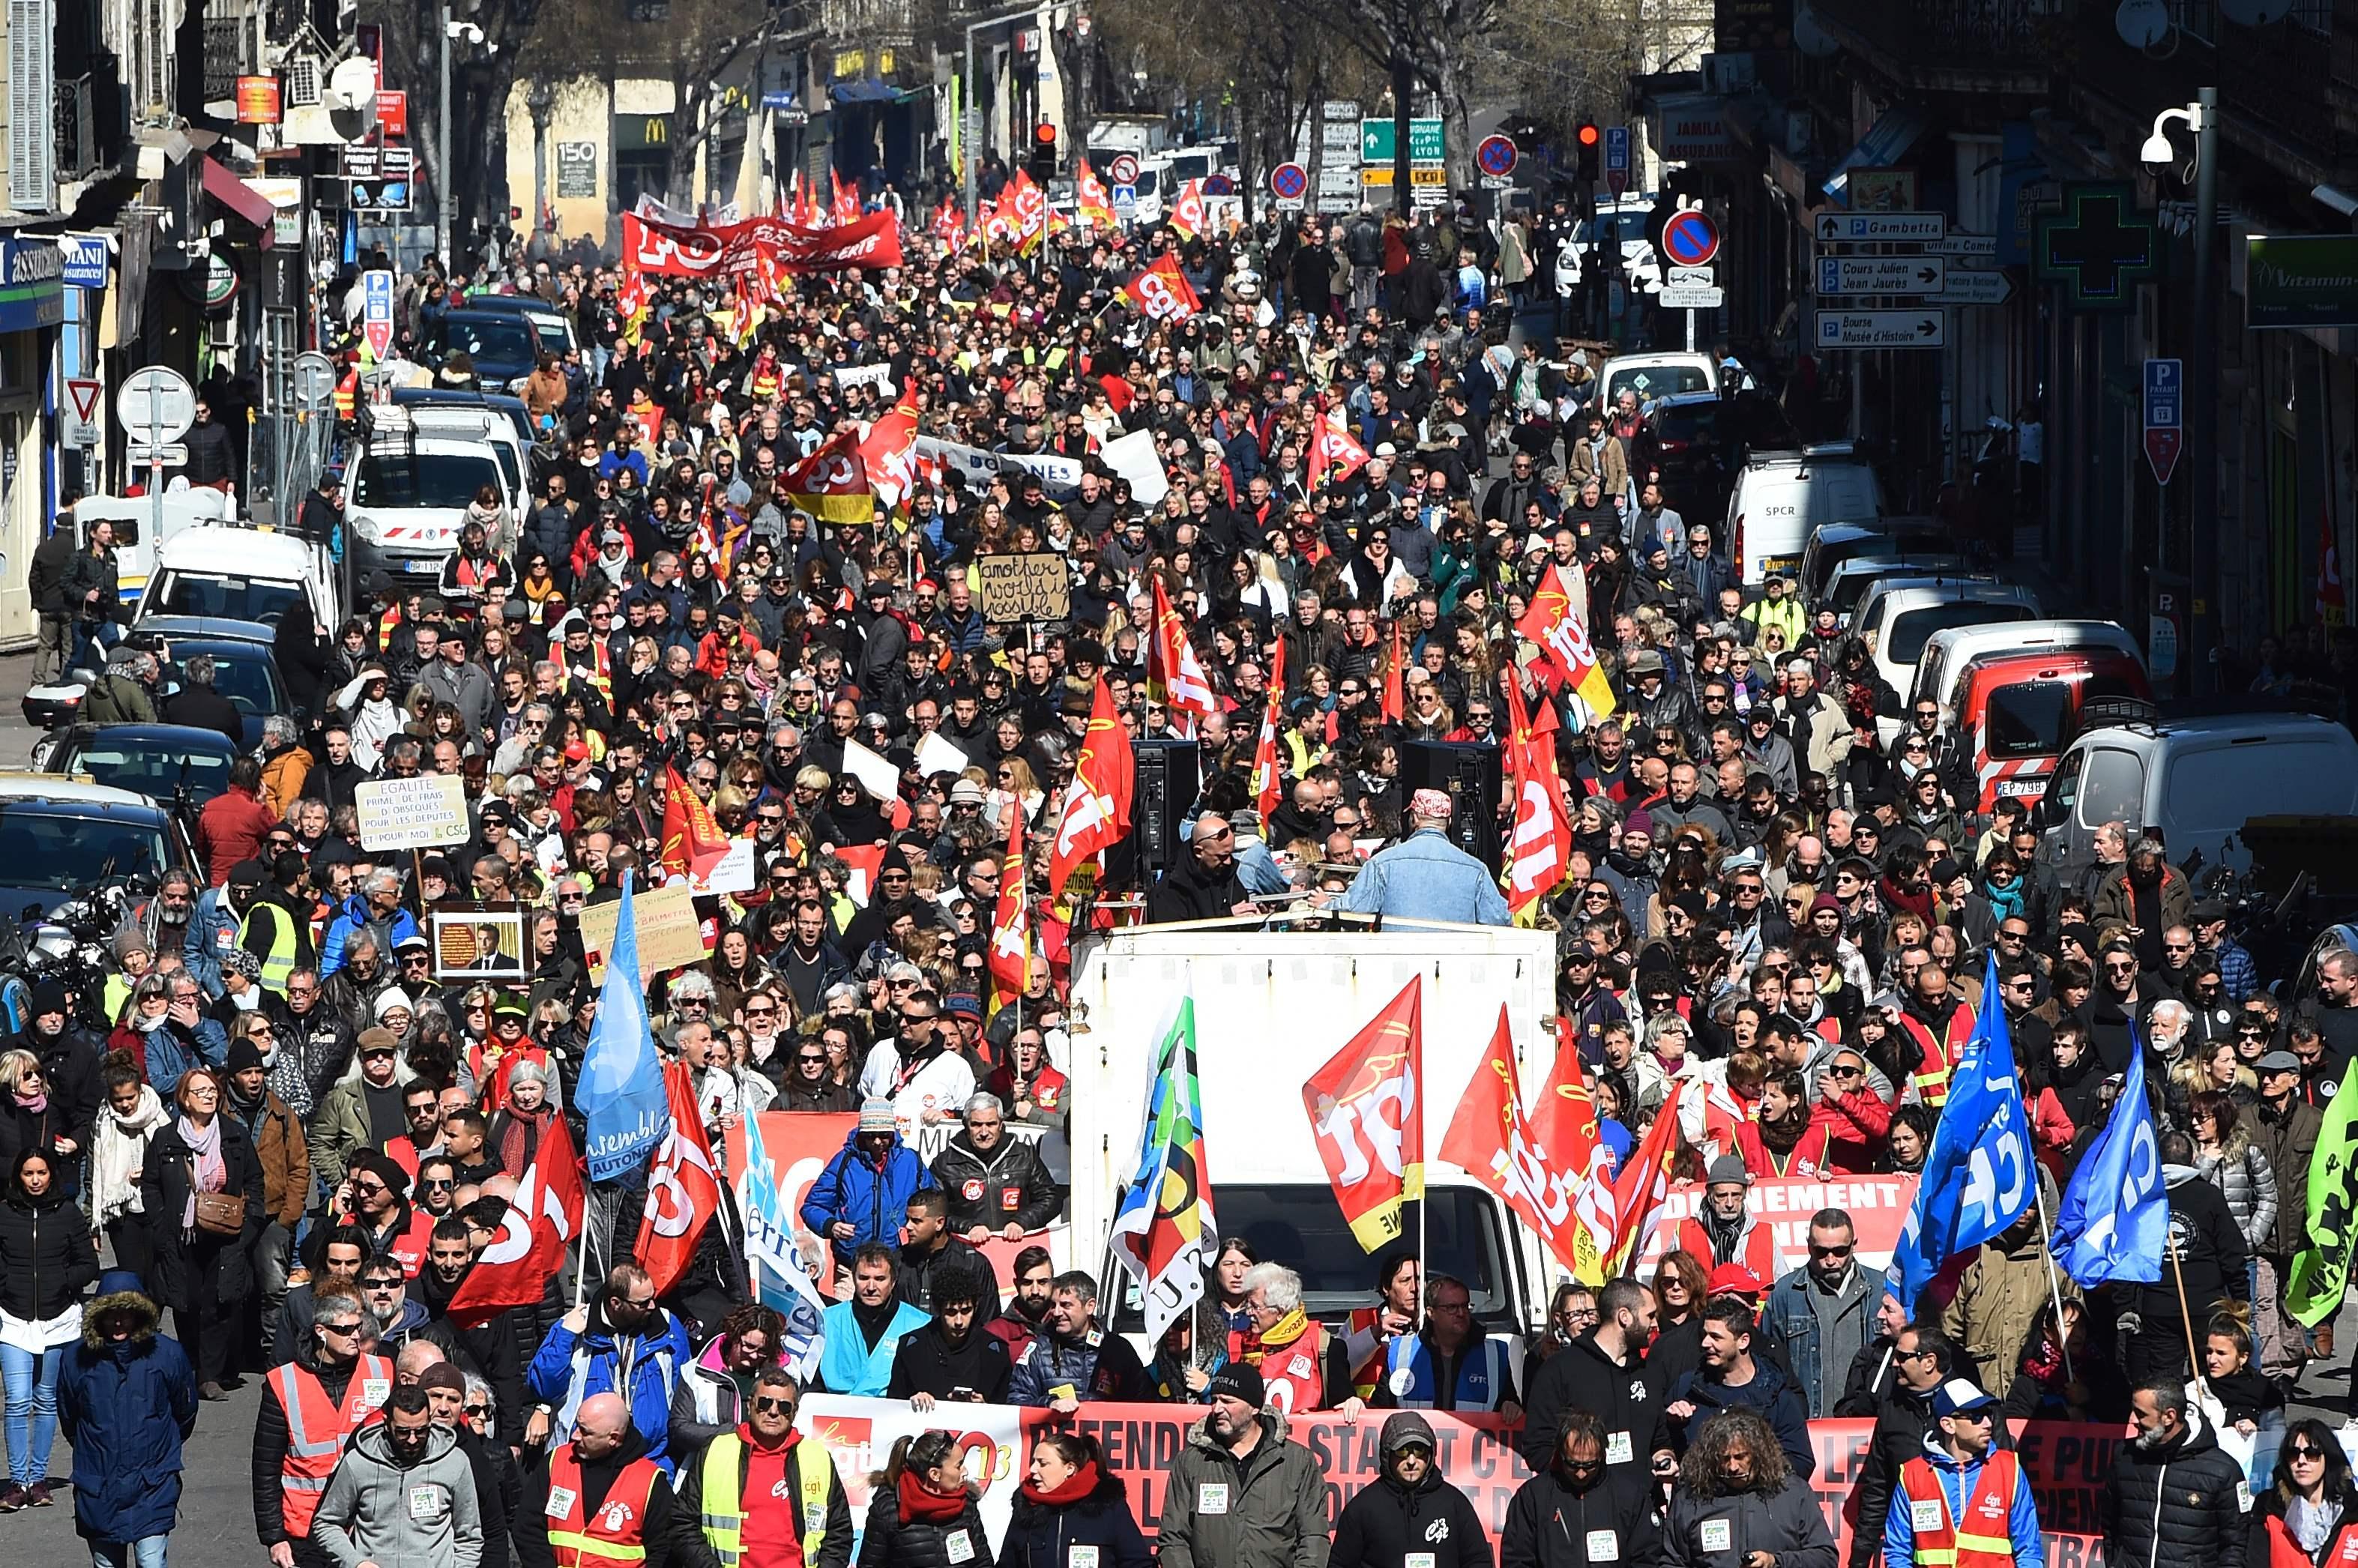 مظاهرات حاشدة فى شوارع فرنسا